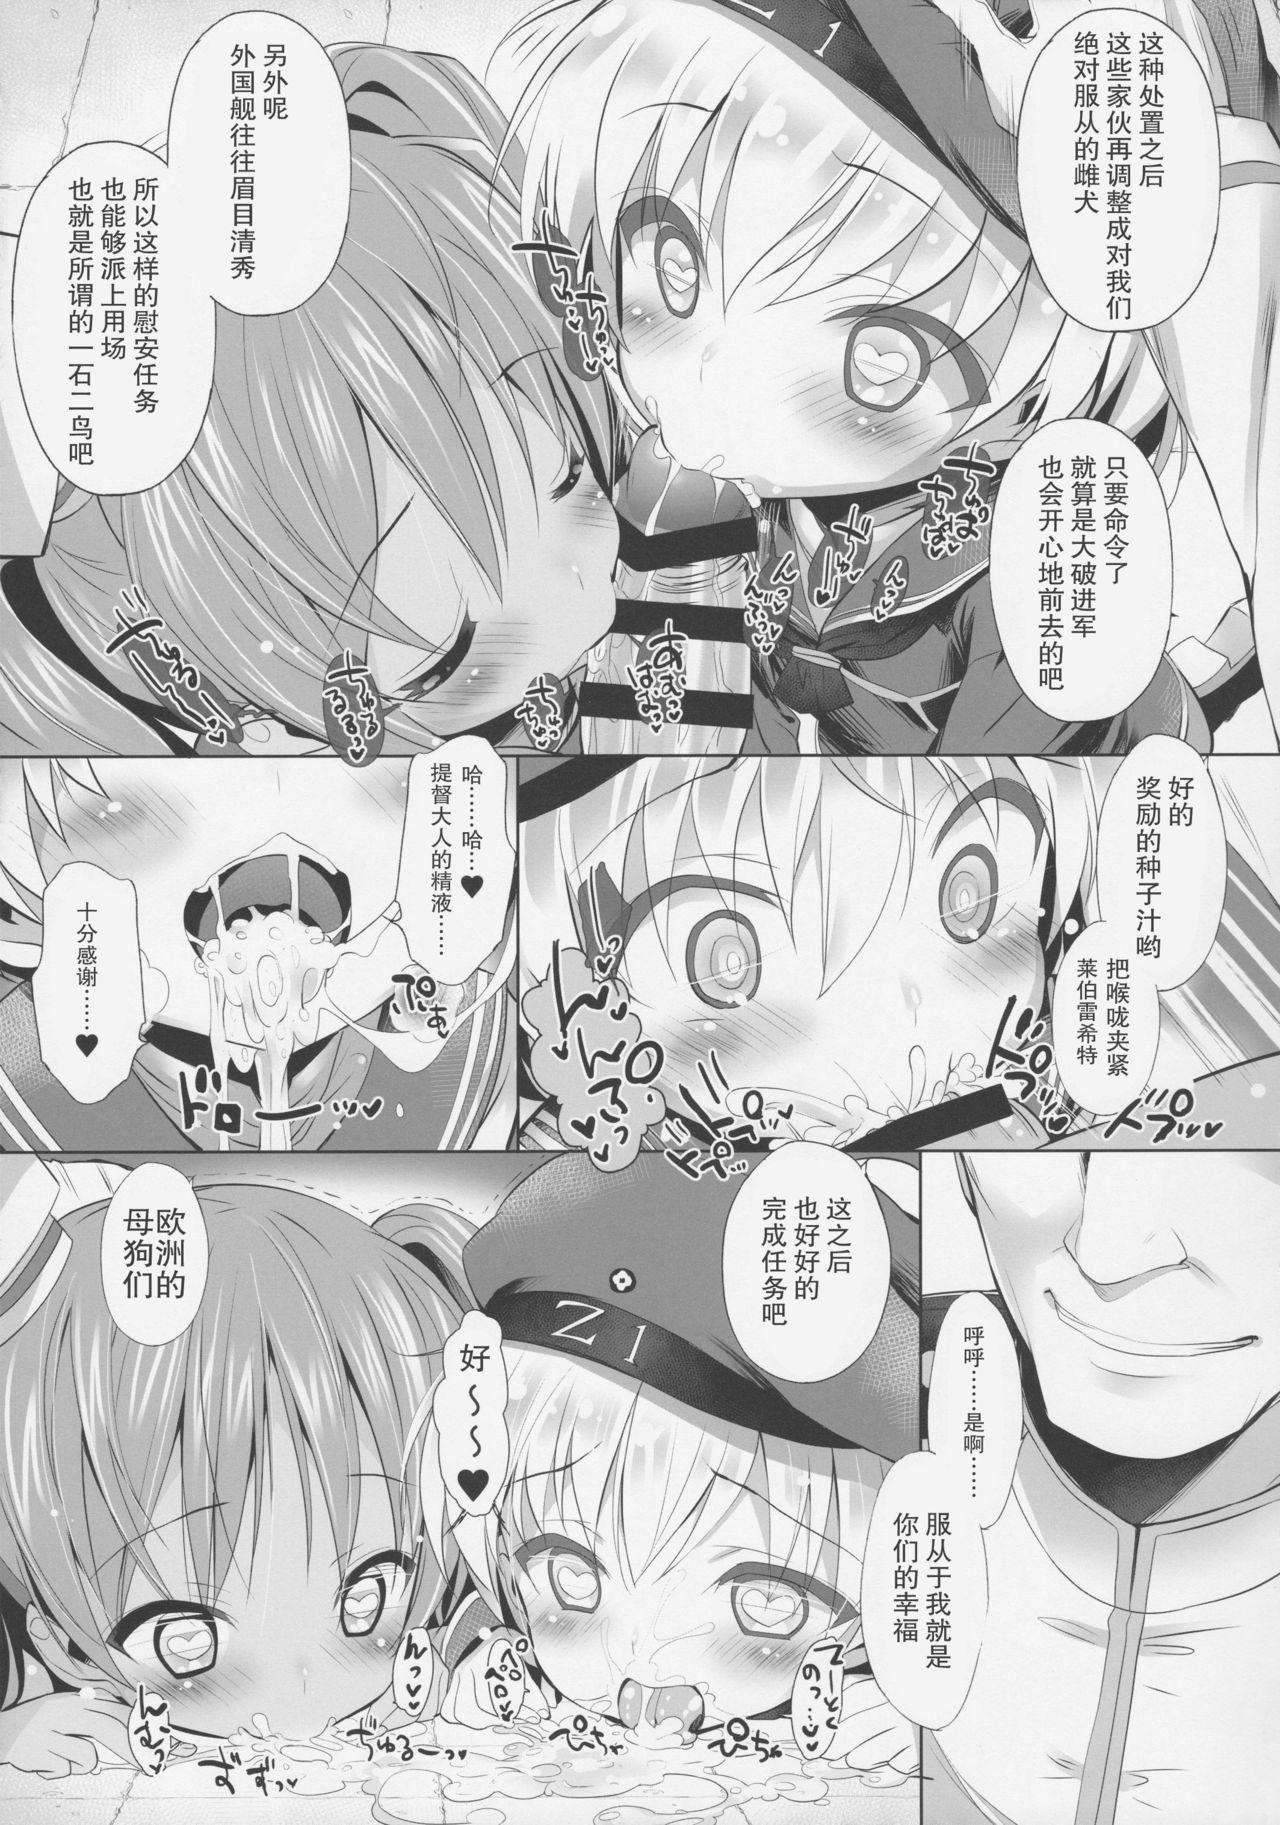 Kaigaikan Kaizou Keikaku 8